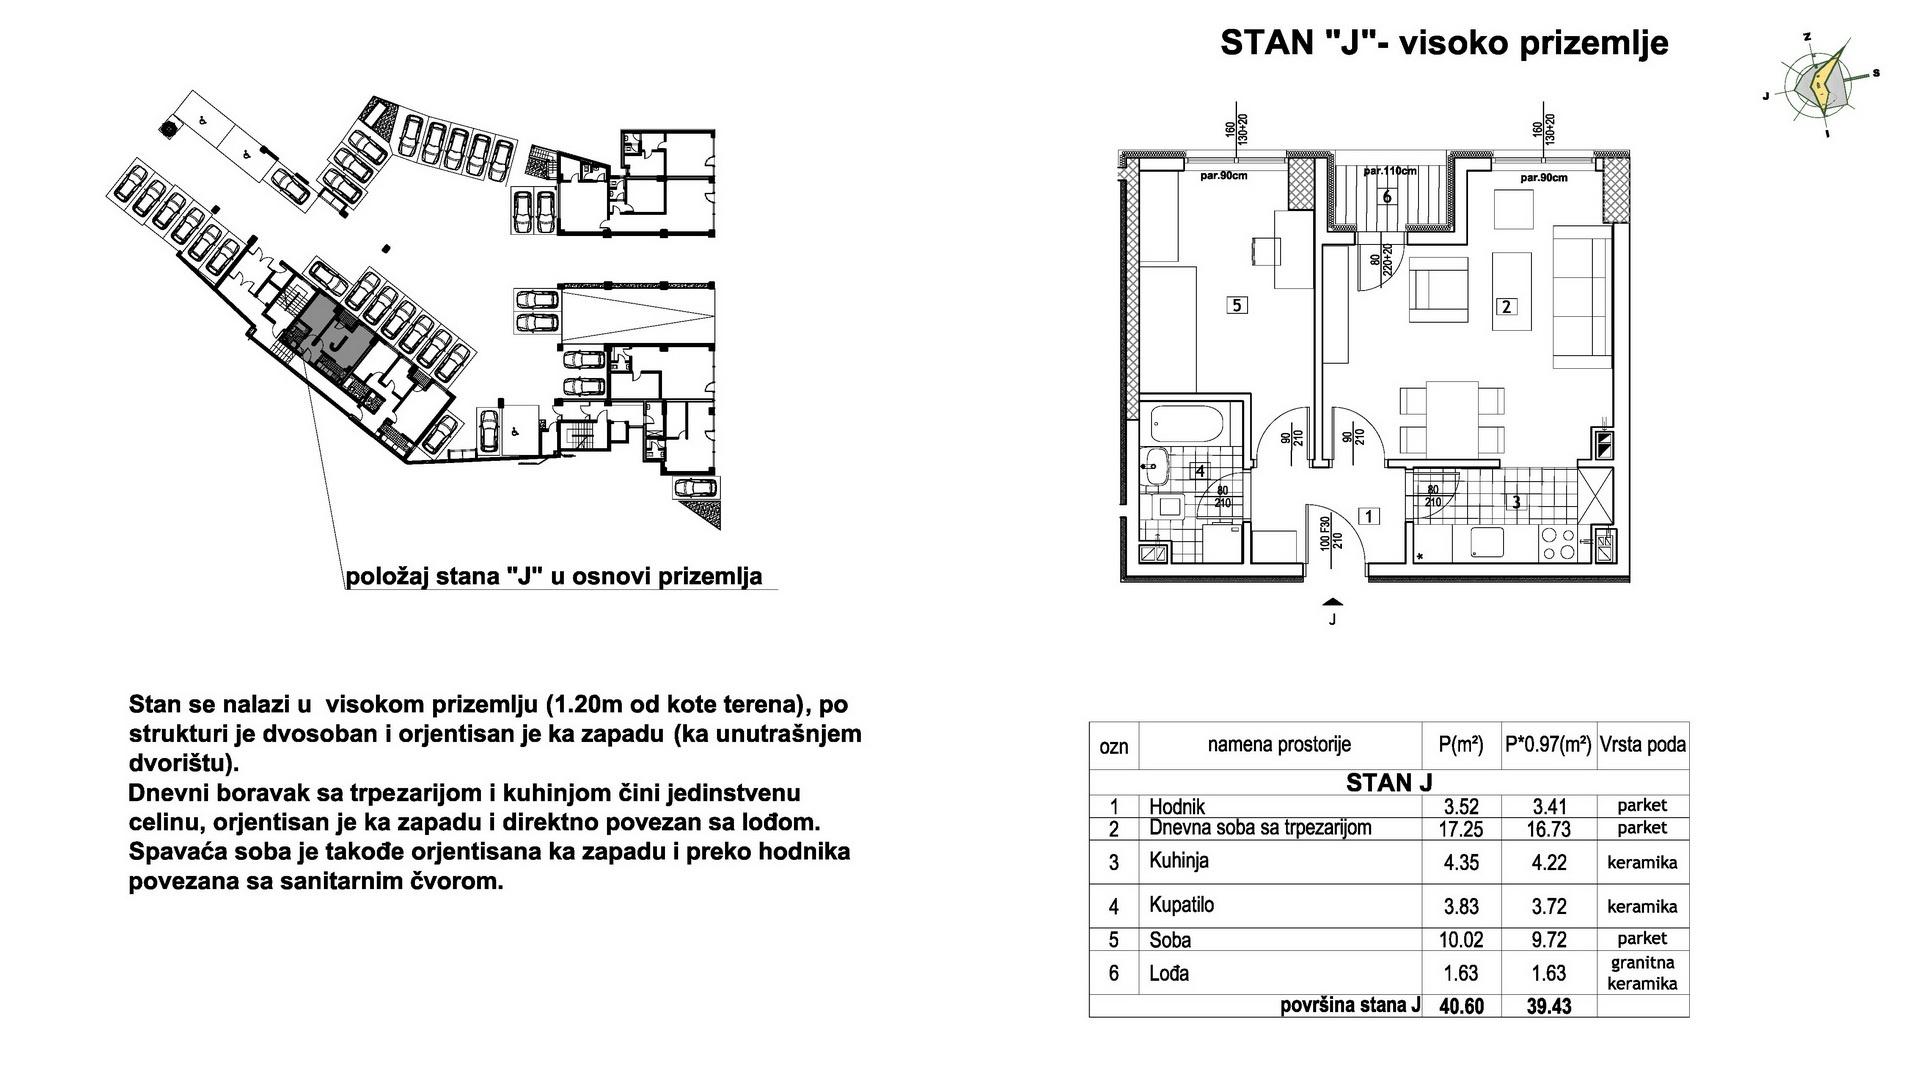 Objekat u Prešernovoj bb - Stan J